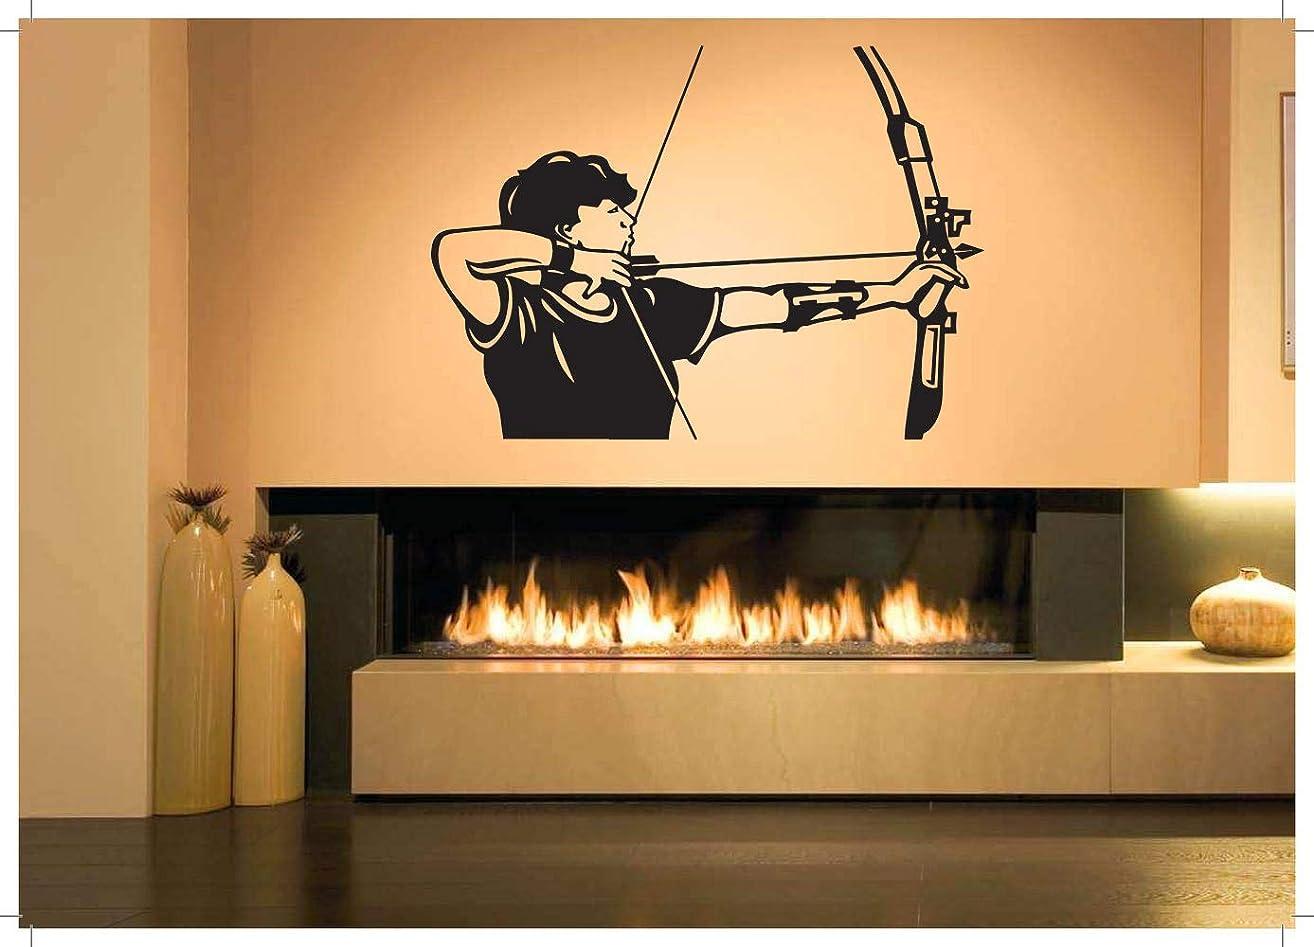 Vinyl Sticker Archer Sniper Sagittarius Hunting Archery Sport Arrow Bow Weapon USA America Military Army Patriot Mural Decal Wall Art Decor SA1862